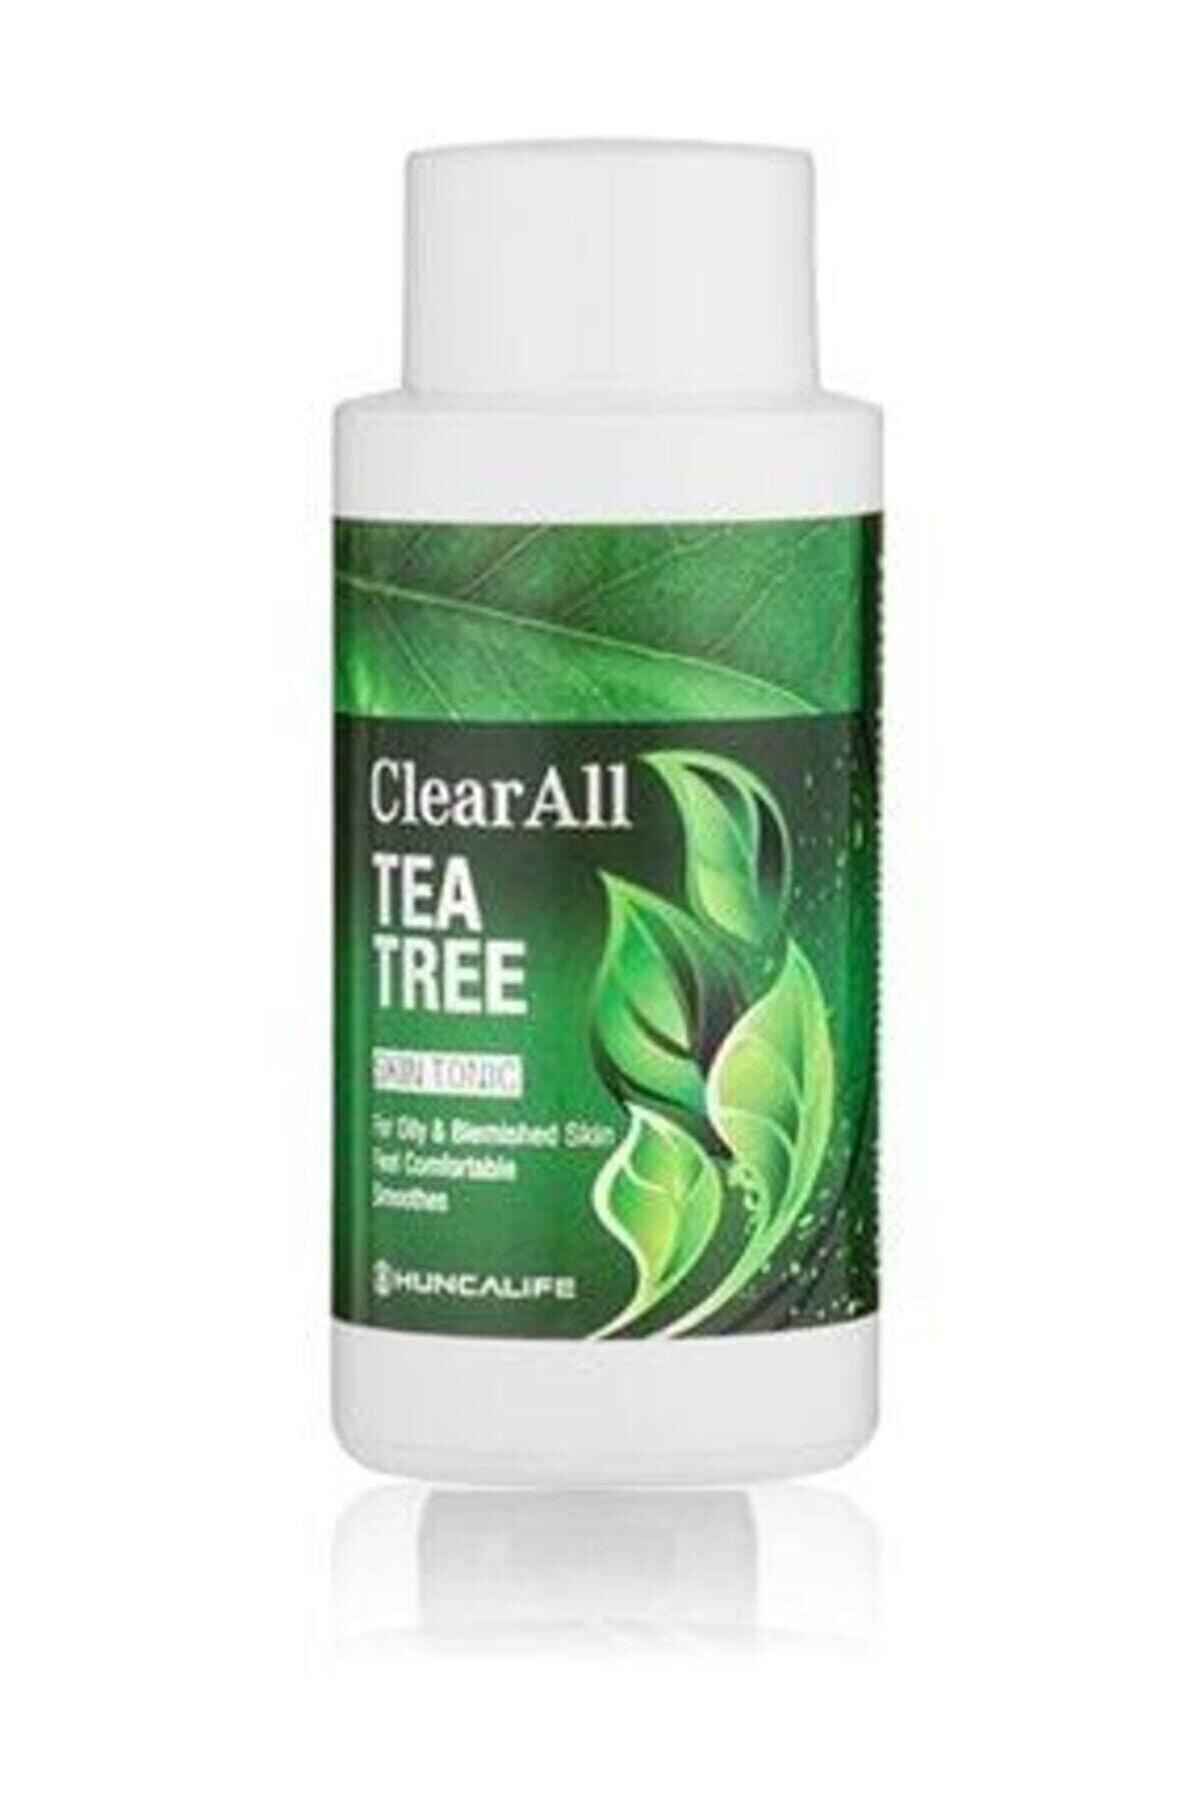 Hunca Clear All Çay Ağaçlı Tonik 150 ml 8690973719133